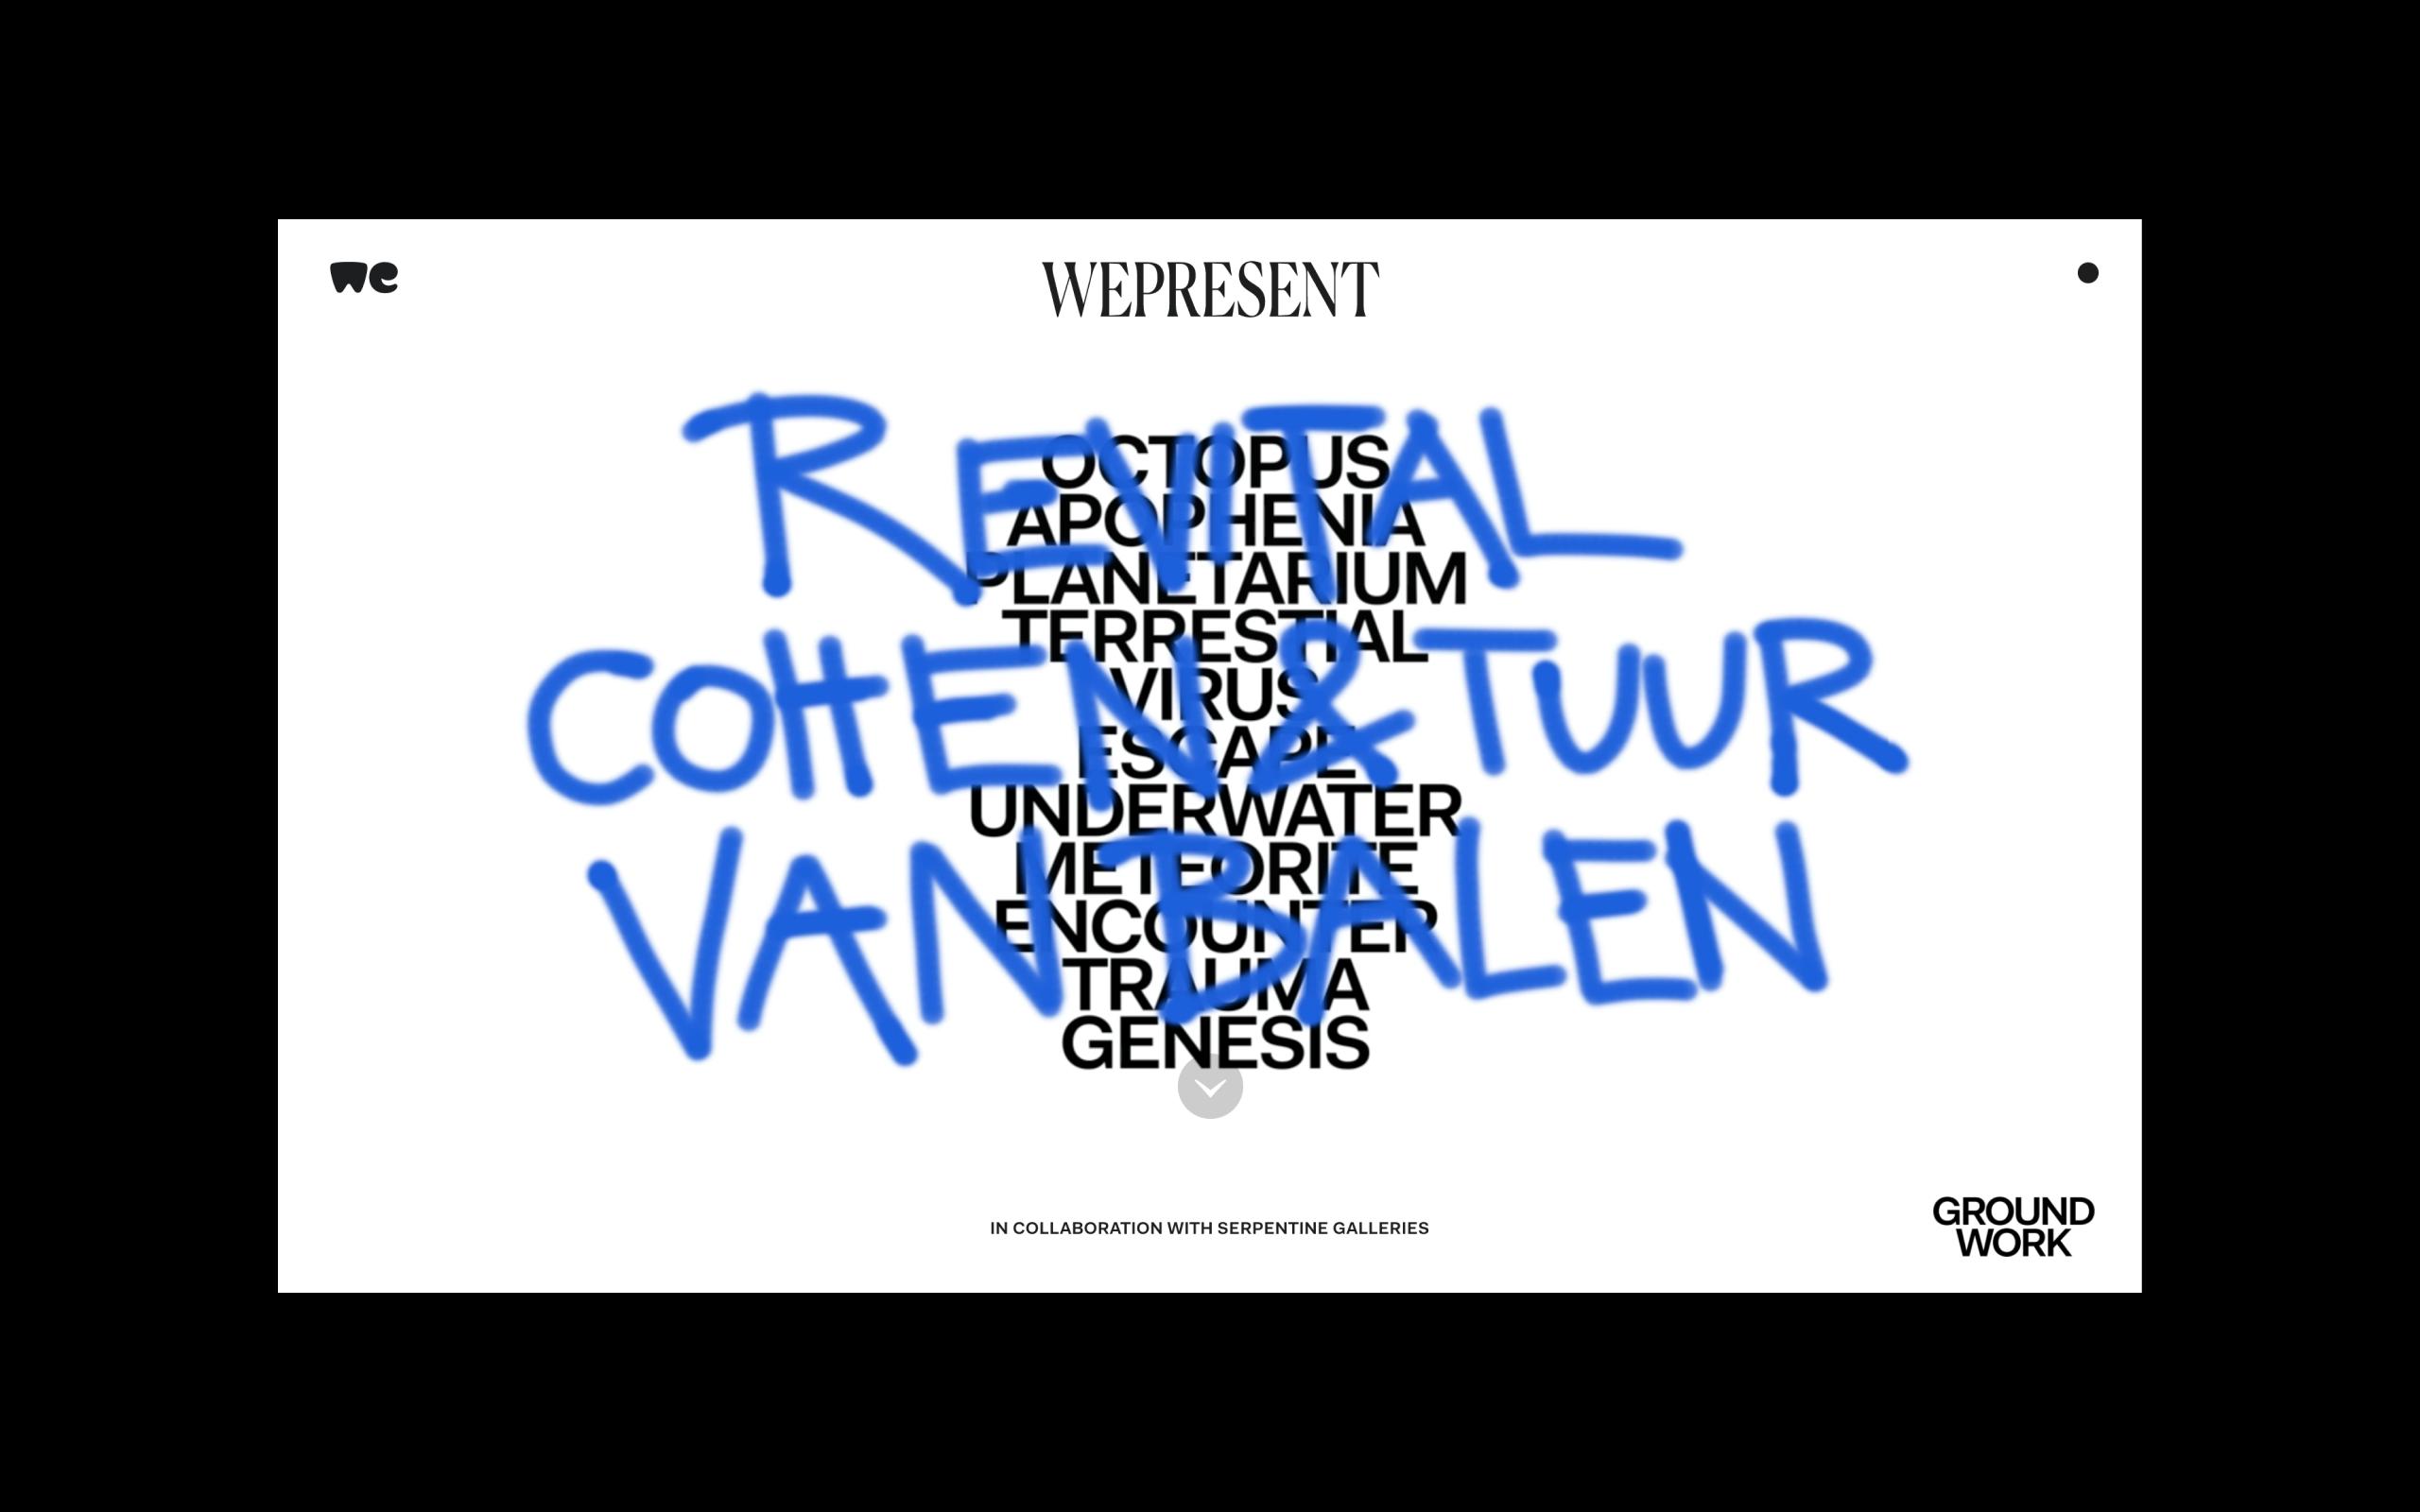 Revital Cohen & Tuur Van Balen Designed by WeTransfer for Groundwork, presented by WePresent x Serpentine.png